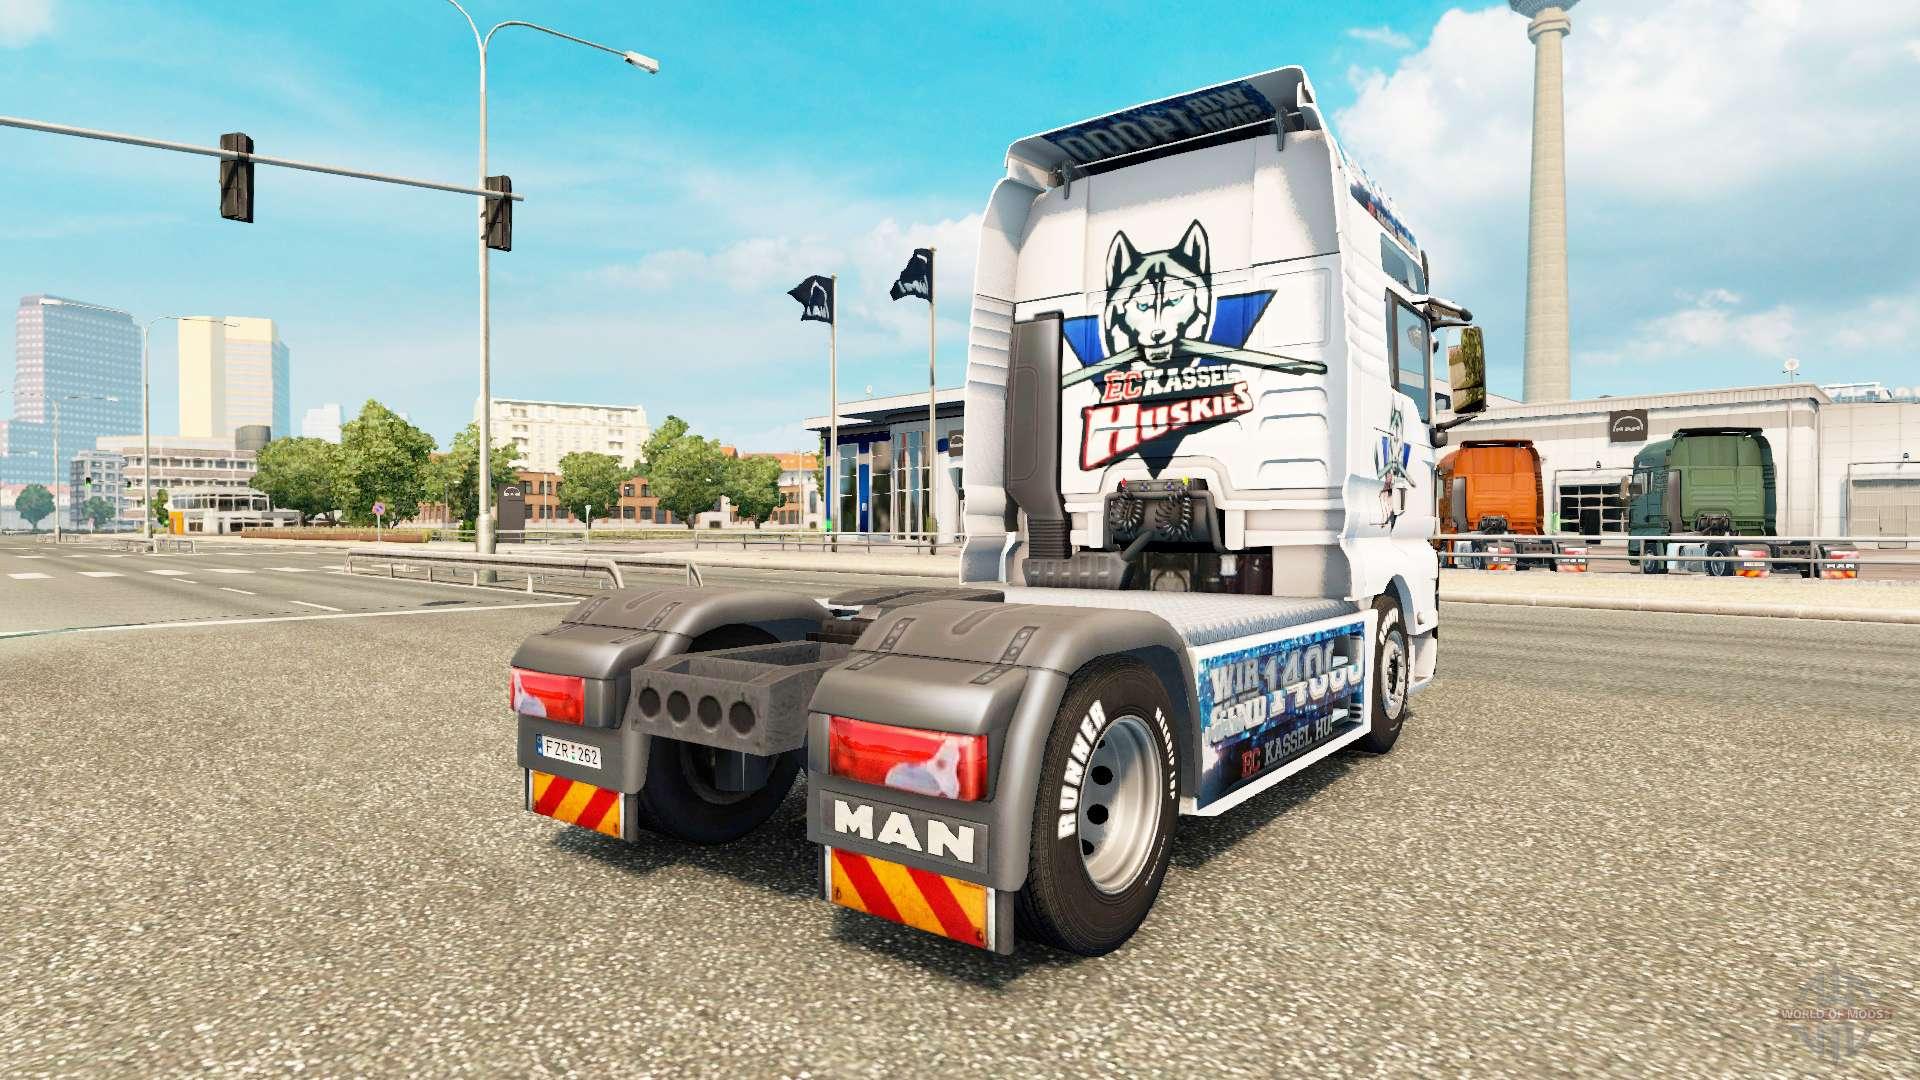 haut ec kassel huskies mann auf einem traktor f r euro truck simulator 2. Black Bedroom Furniture Sets. Home Design Ideas